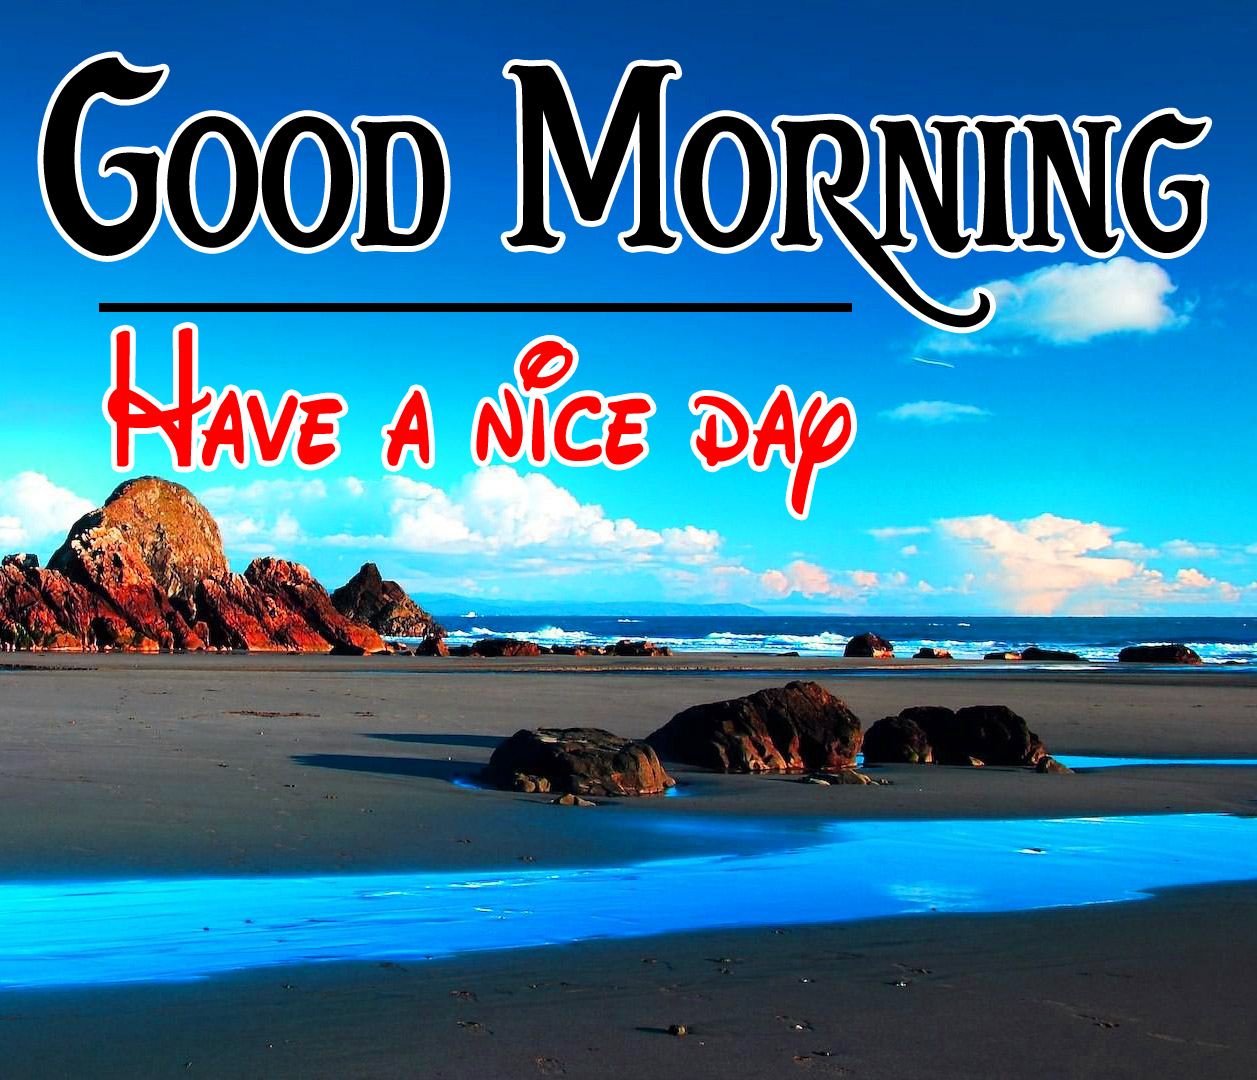 Good Morning Pics 120